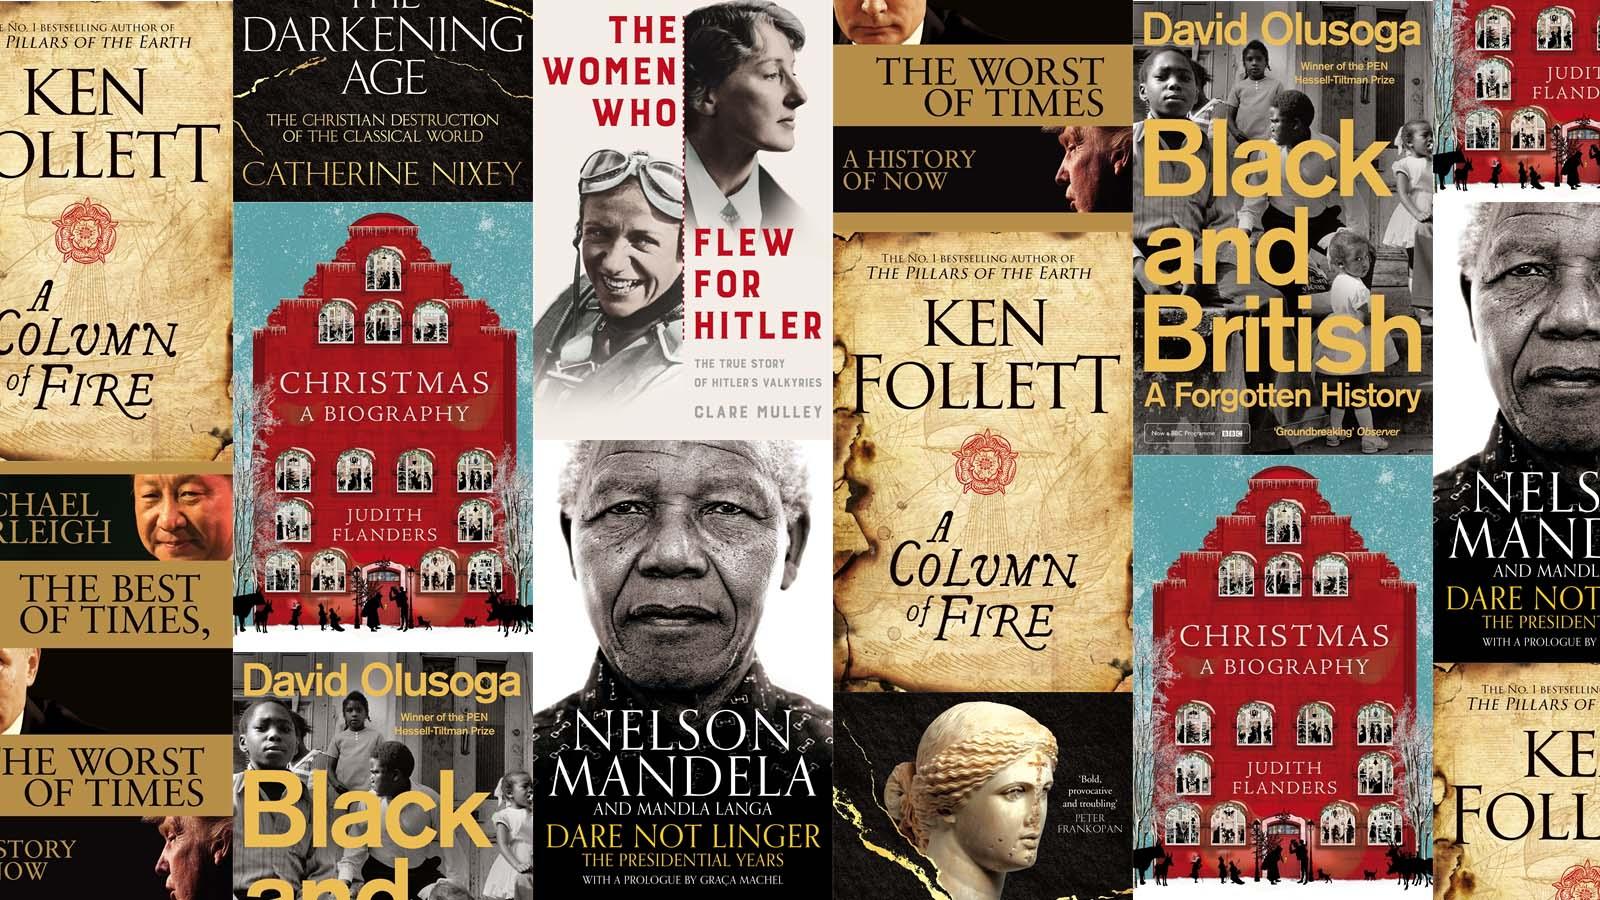 New books from Pan Macmillan